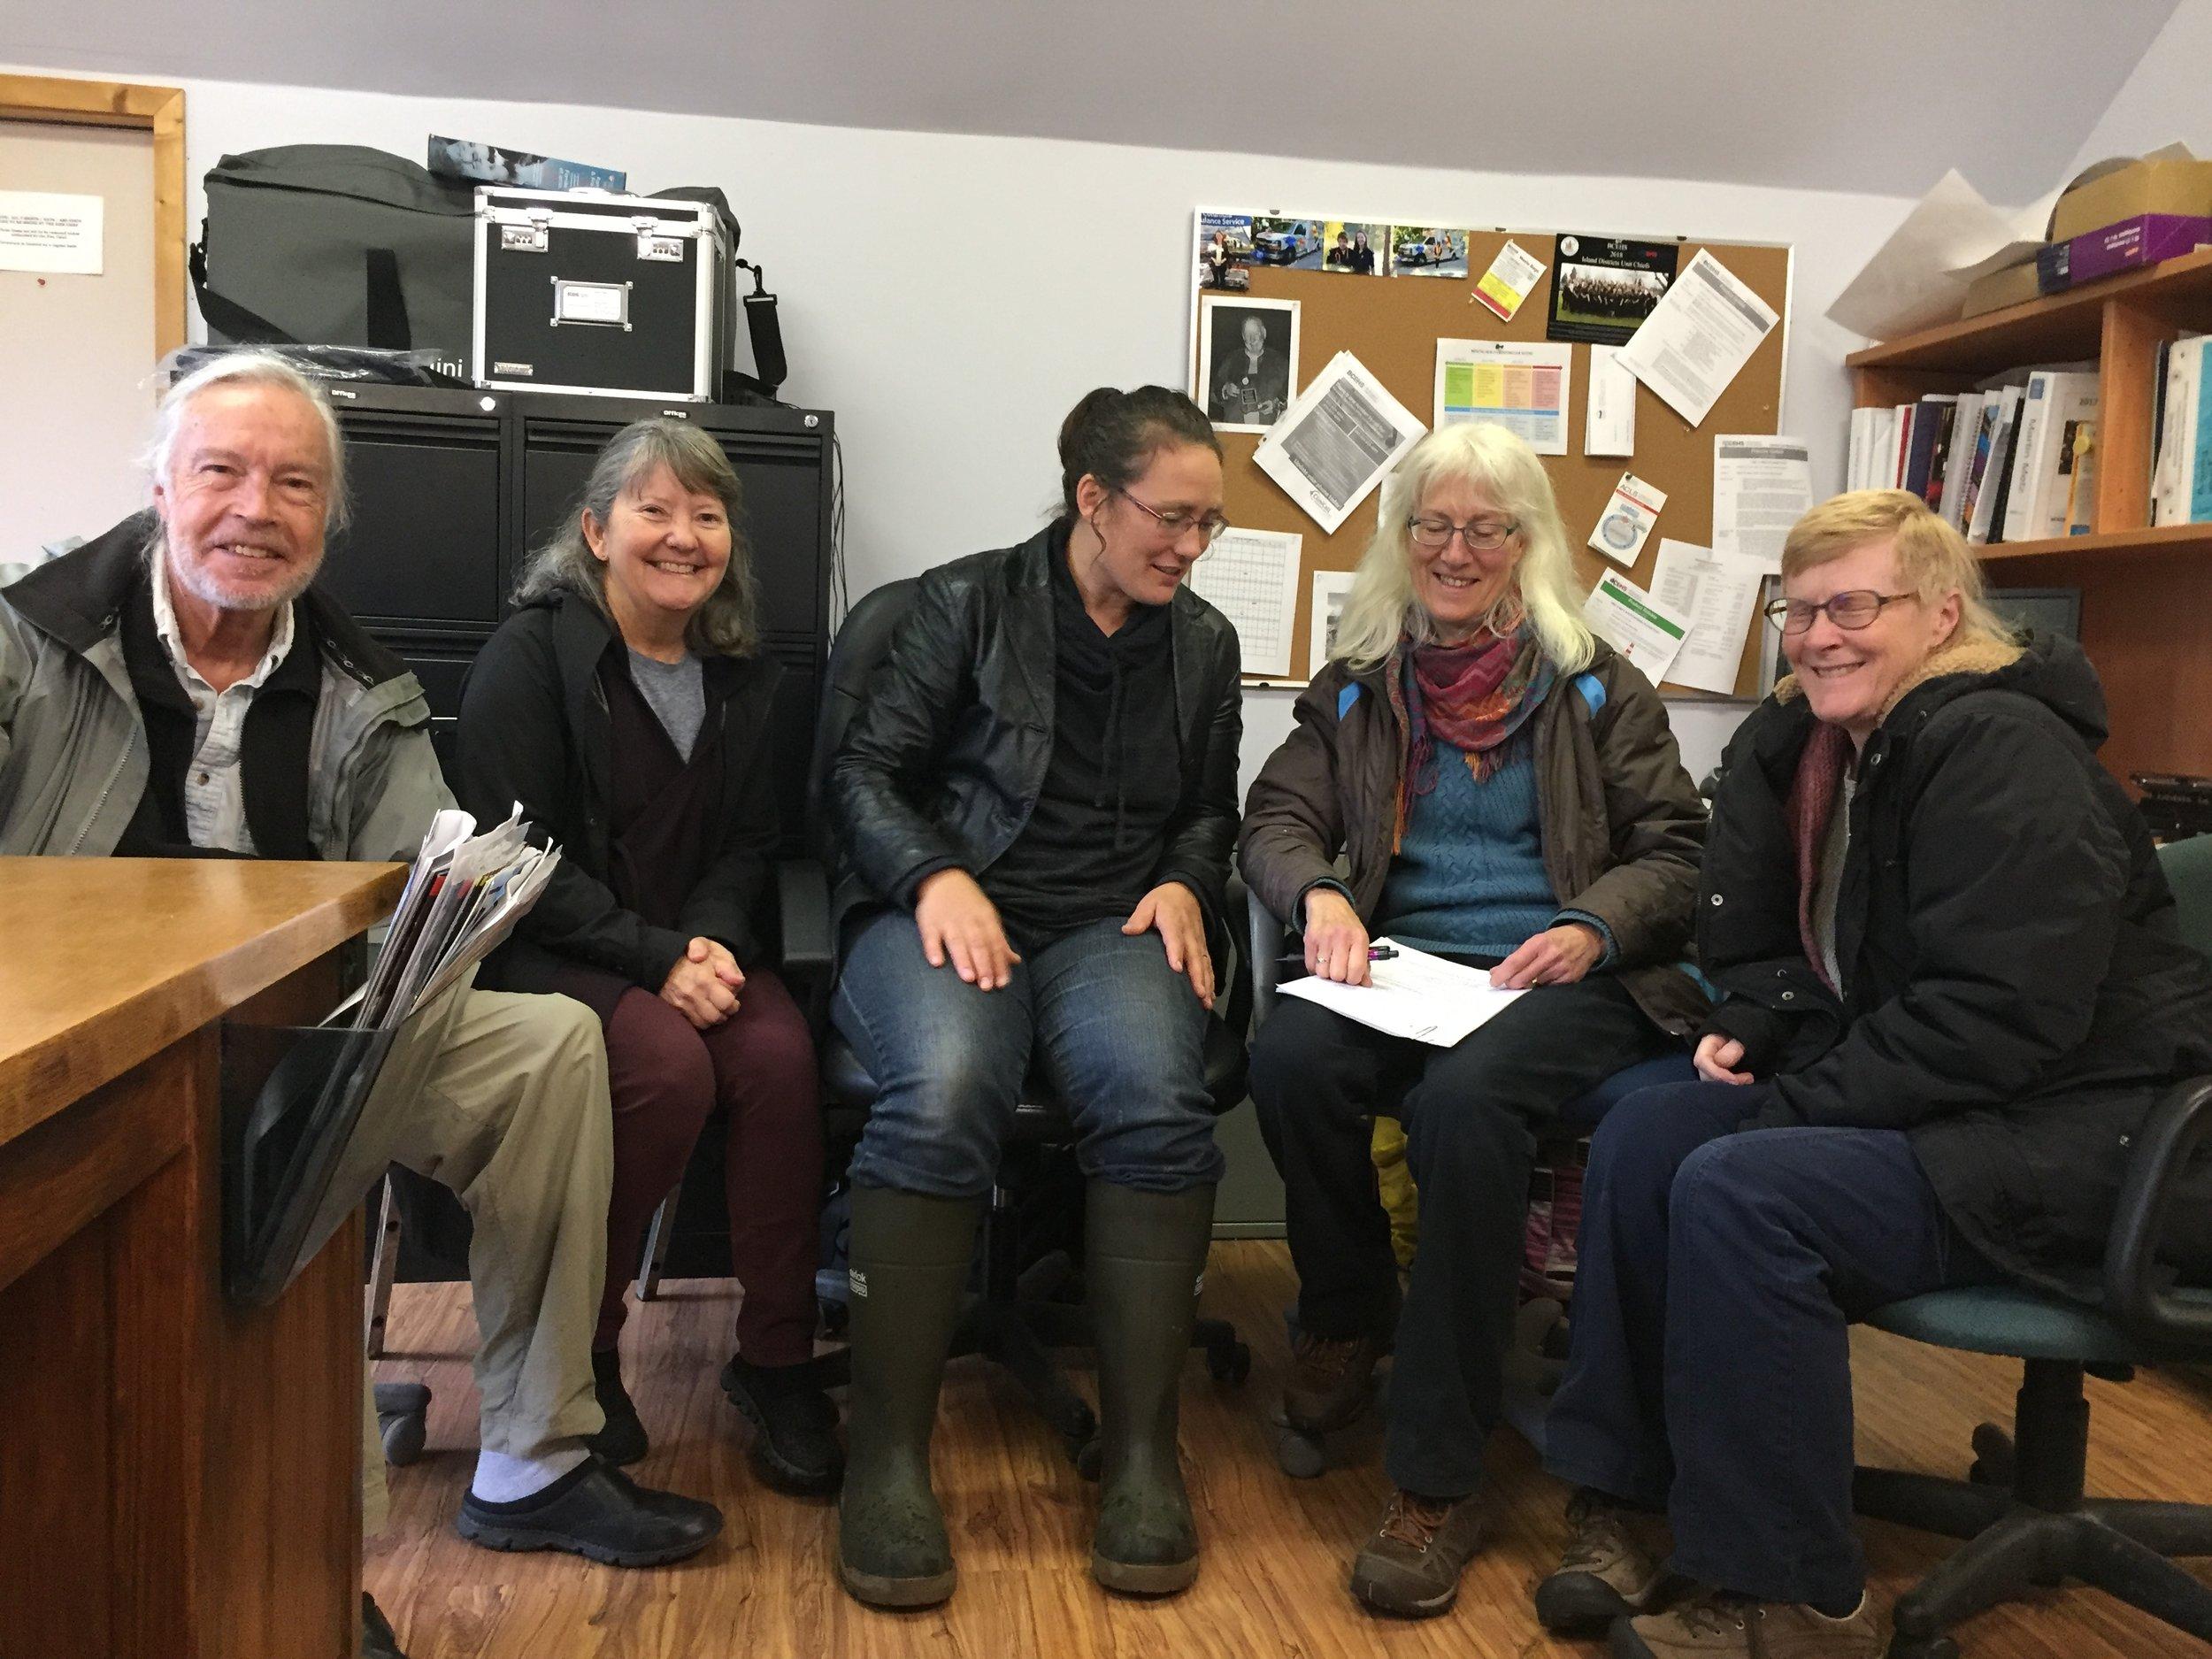 Photo left to right – John Blaxall, Mary-Jo Woolgar, me, Carina Verhoeve & Bernice McGowan.